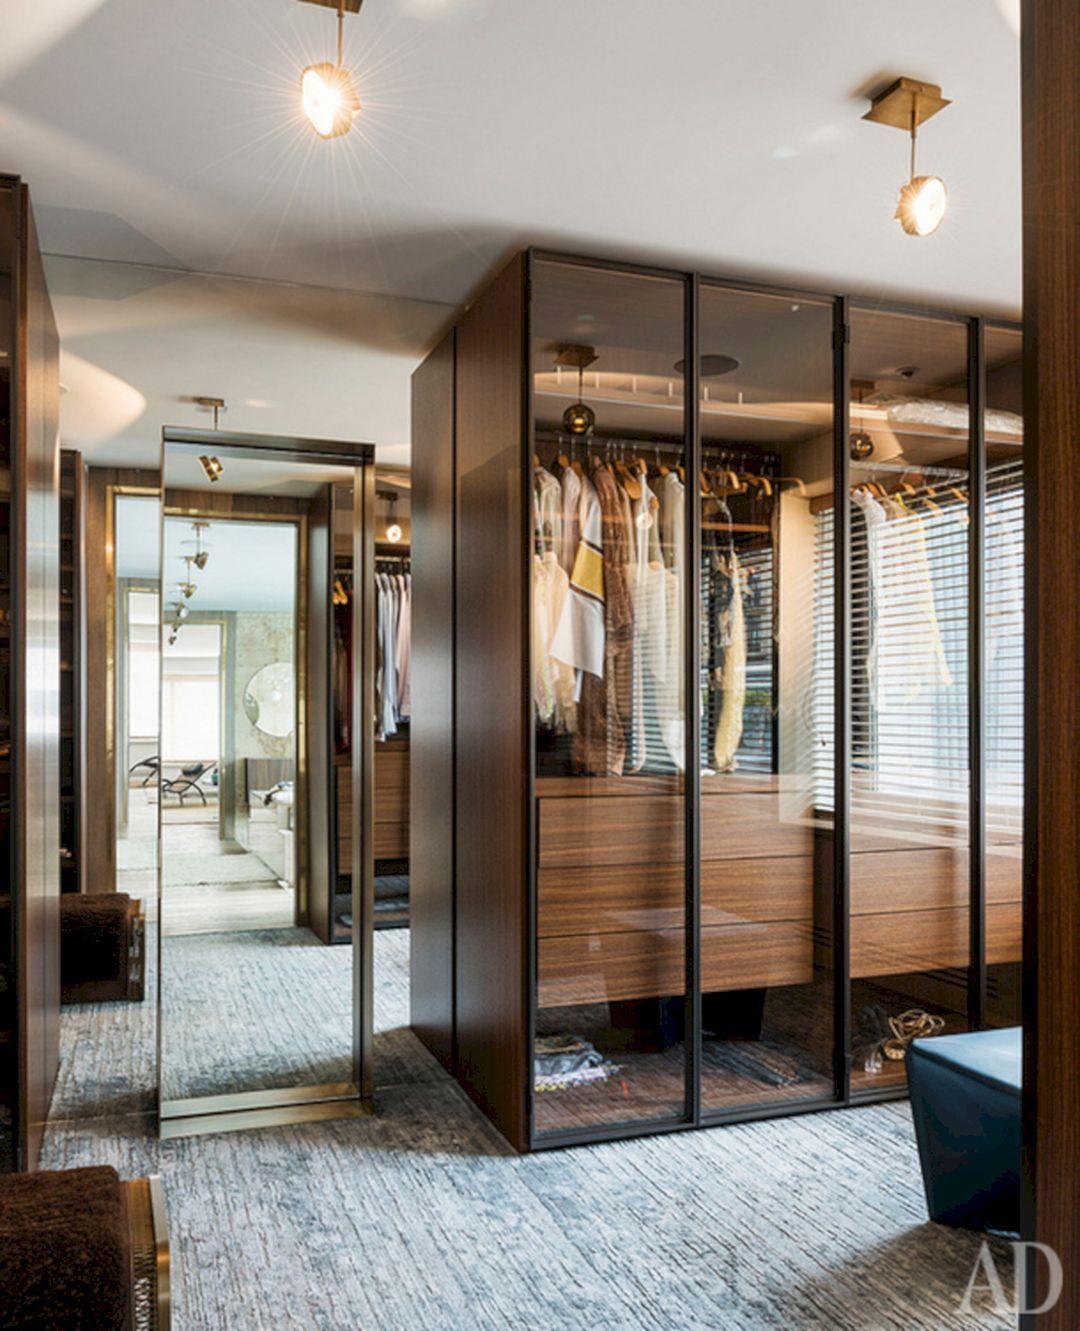 10 Best Man Closet Design Ideas To Easily Organize